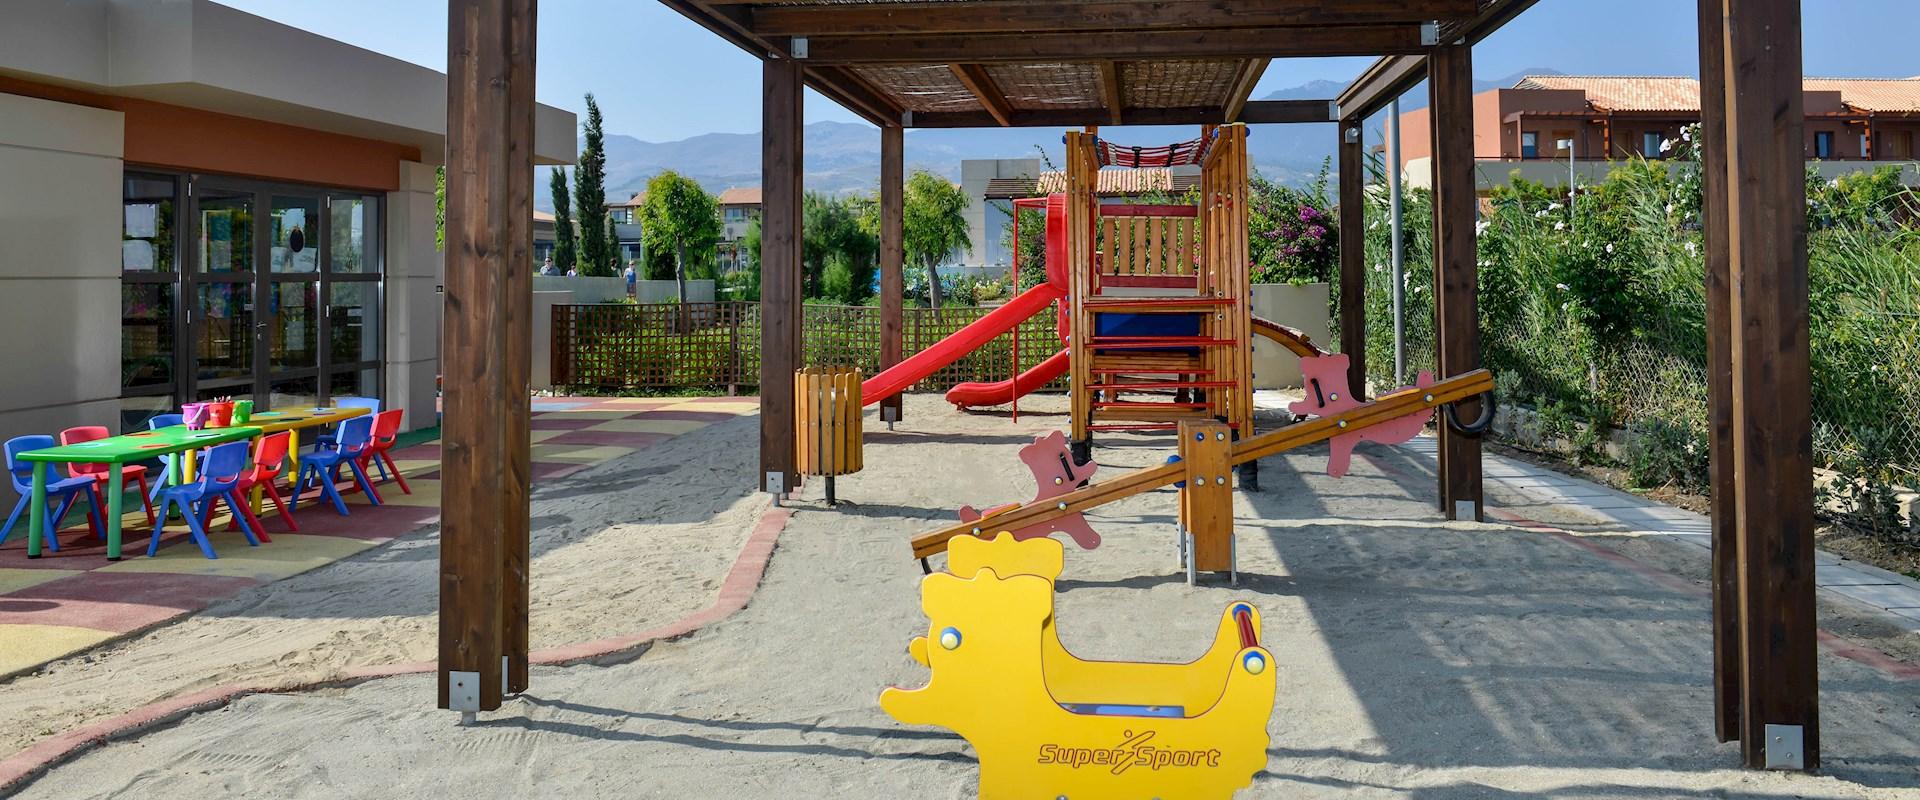 Kos family hotel playground